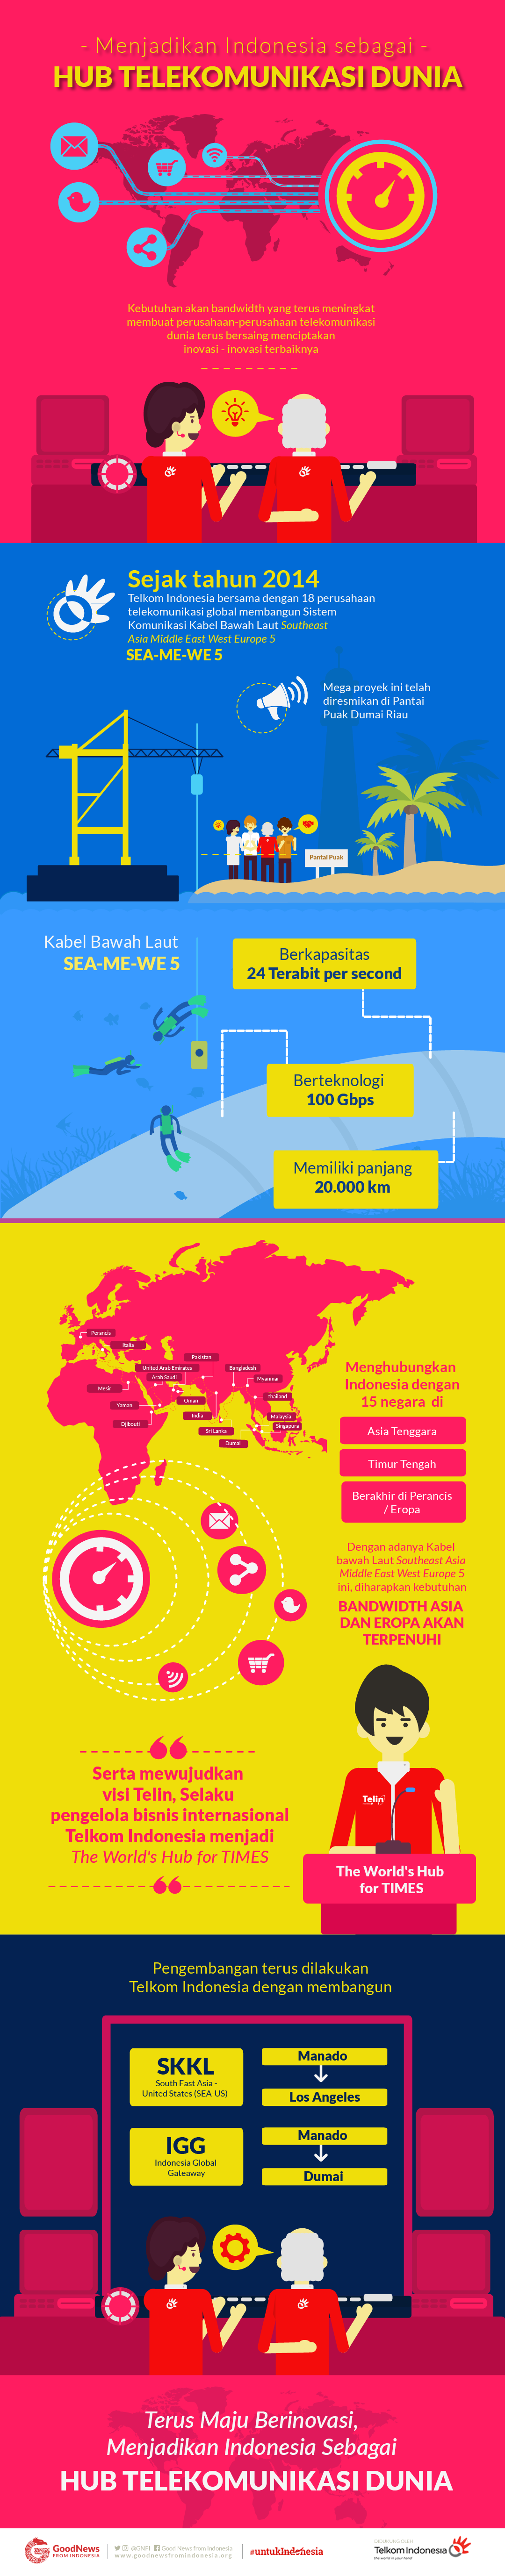 Hub Telekomunikasi Dunia